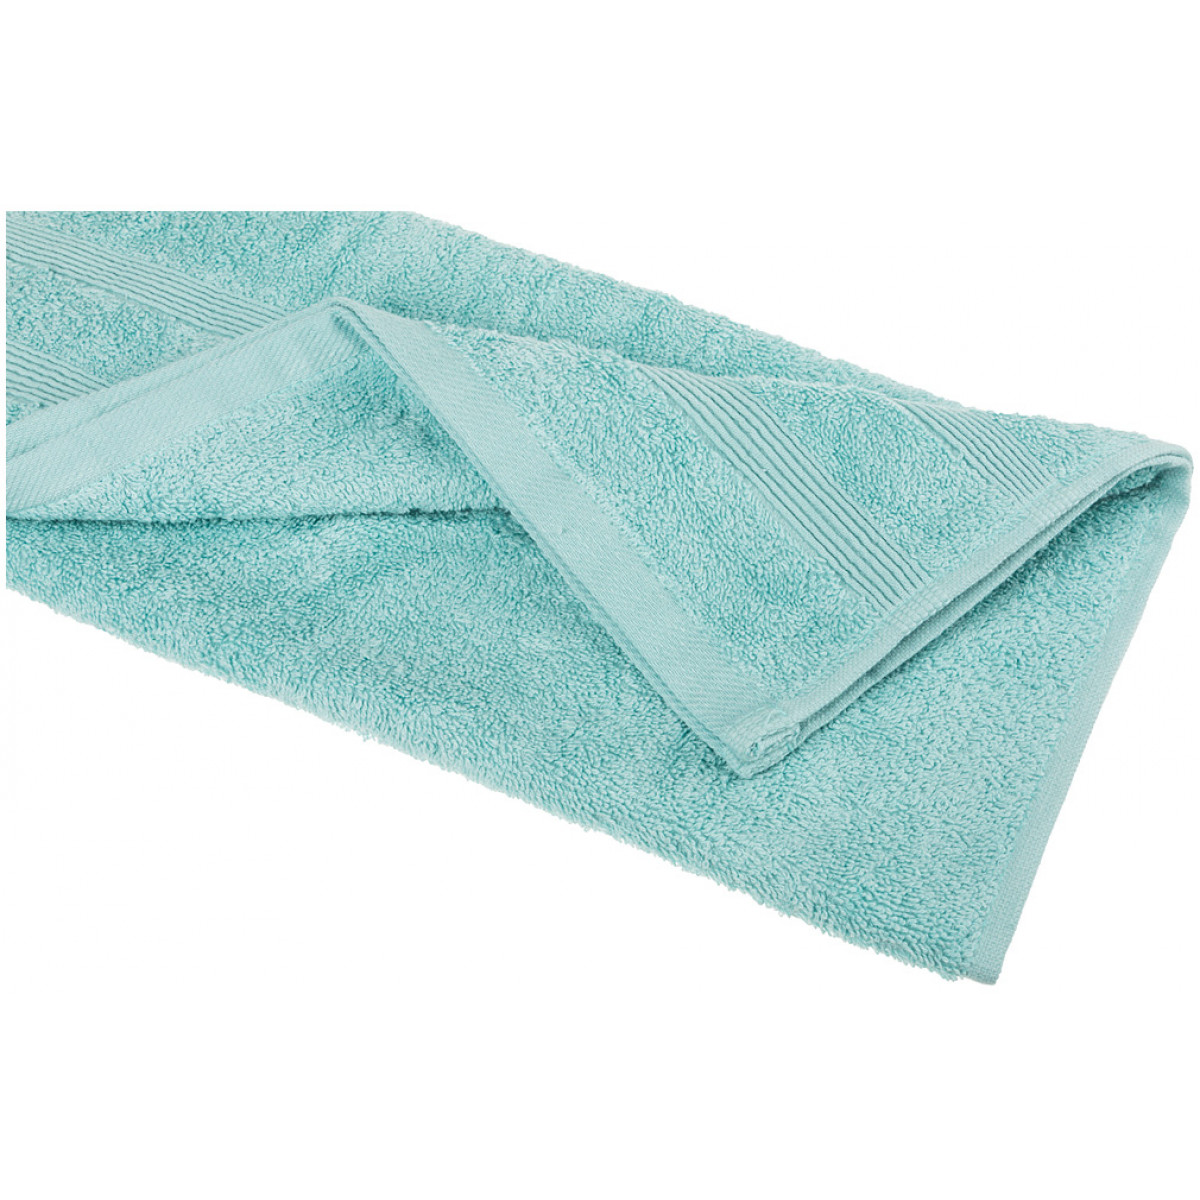 Полотенца Santalino Полотенце Azriel  (40х70 см) полотенца santalino полотенце shulamite 40х70 см